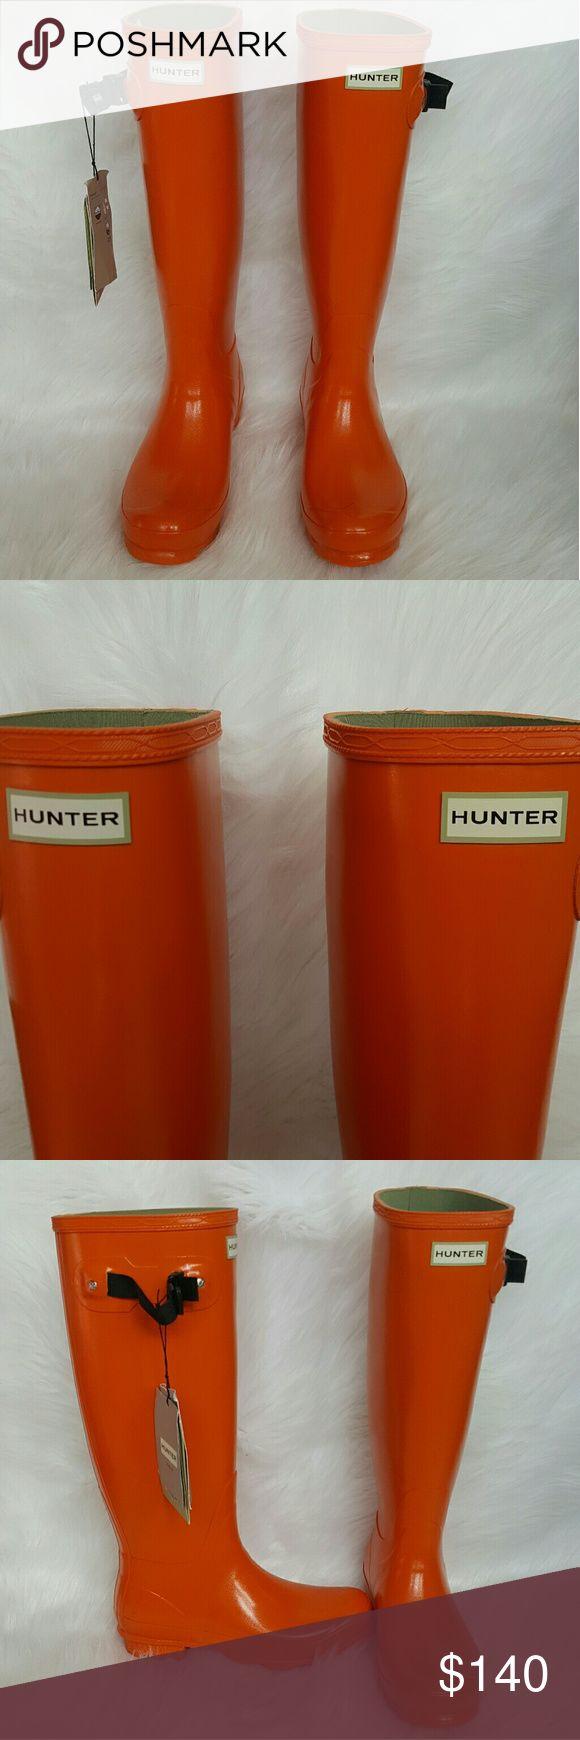 NWT Hunter Norris Field Gloss Rain Boots Size 9 Hunter  Ladies Norris Field Gloss Wellies  Orange Lichen Rain Boots  Size US 9 Hunter Shoes Winter & Rain Boots